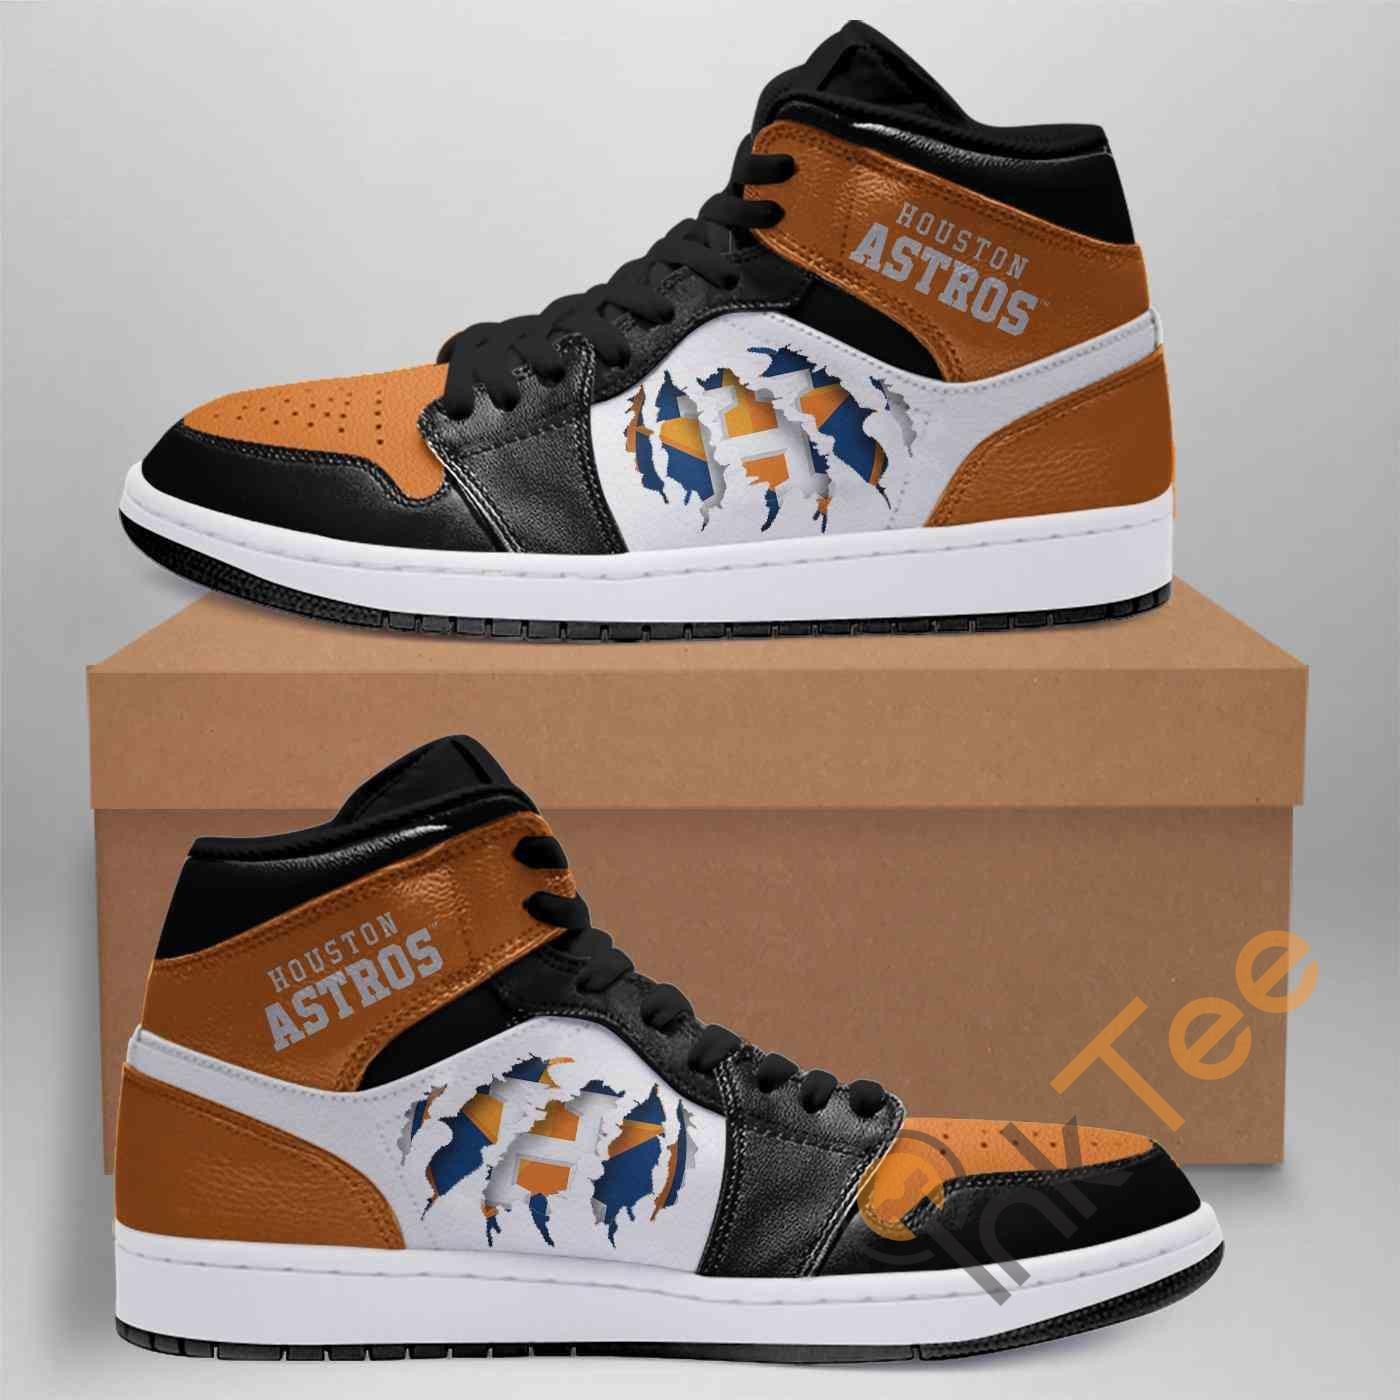 Houston Astros Mlb Custom Air Jordan Shoes